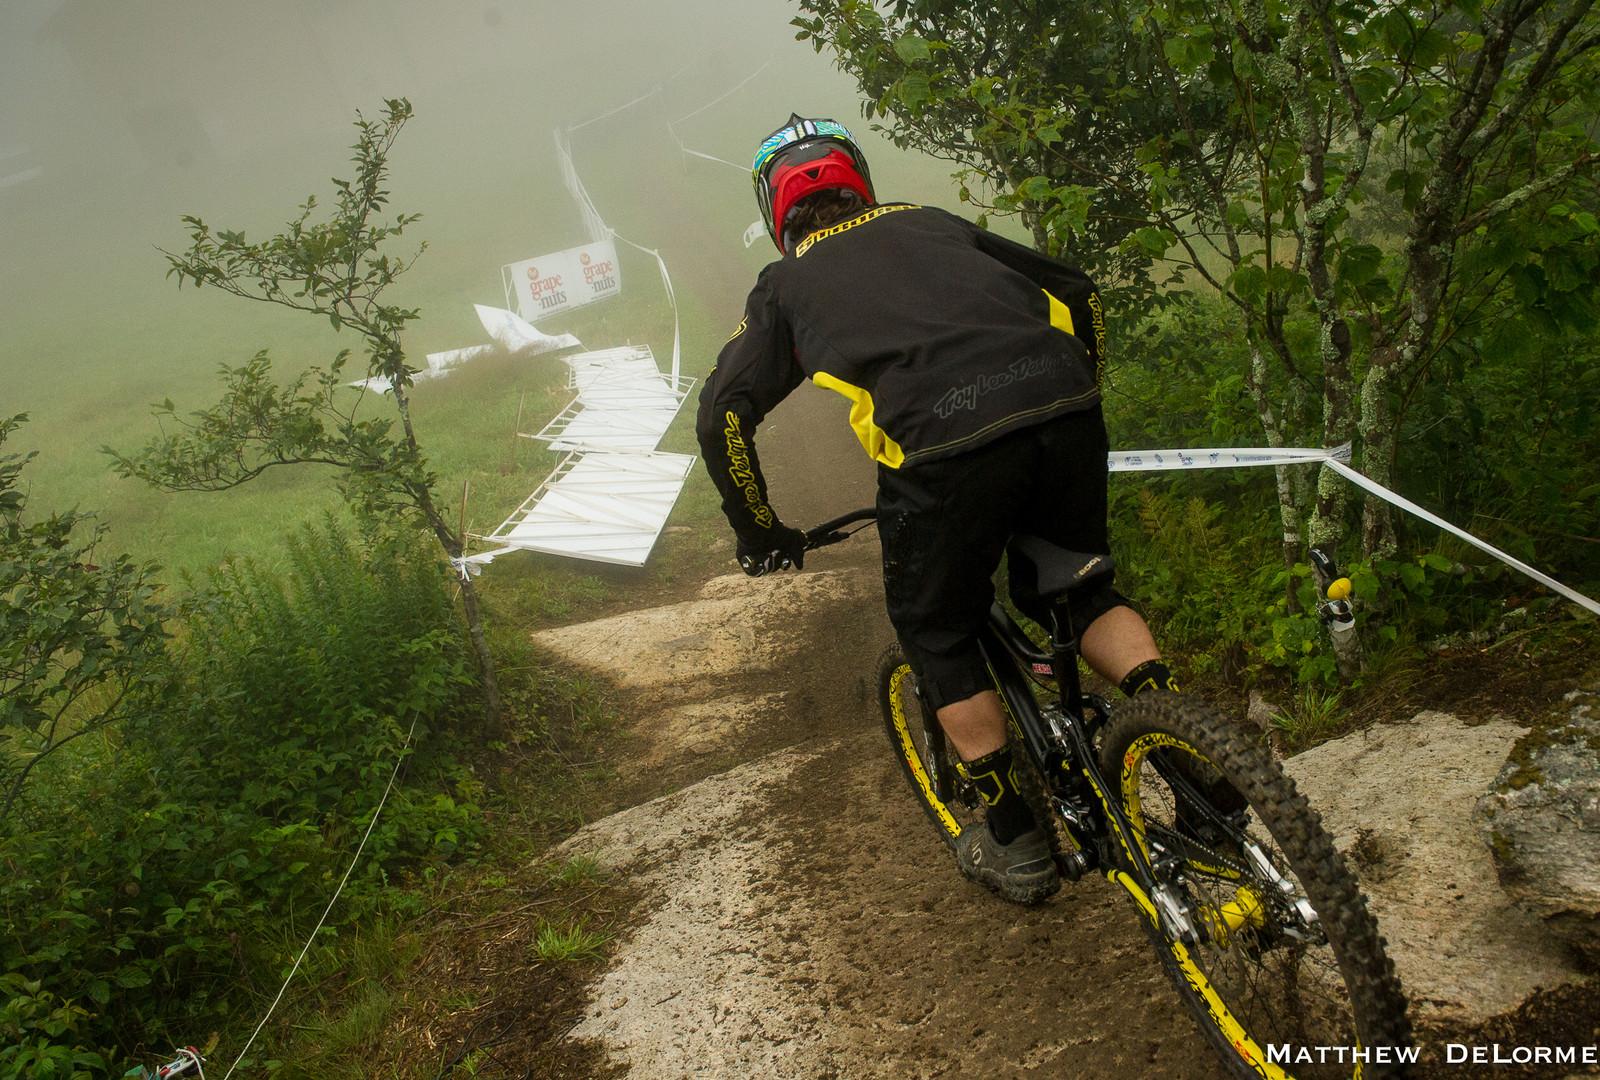 Luke Strobel - U.S. National Champs  Finals - Mountain Biking Pictures - Vital MTB